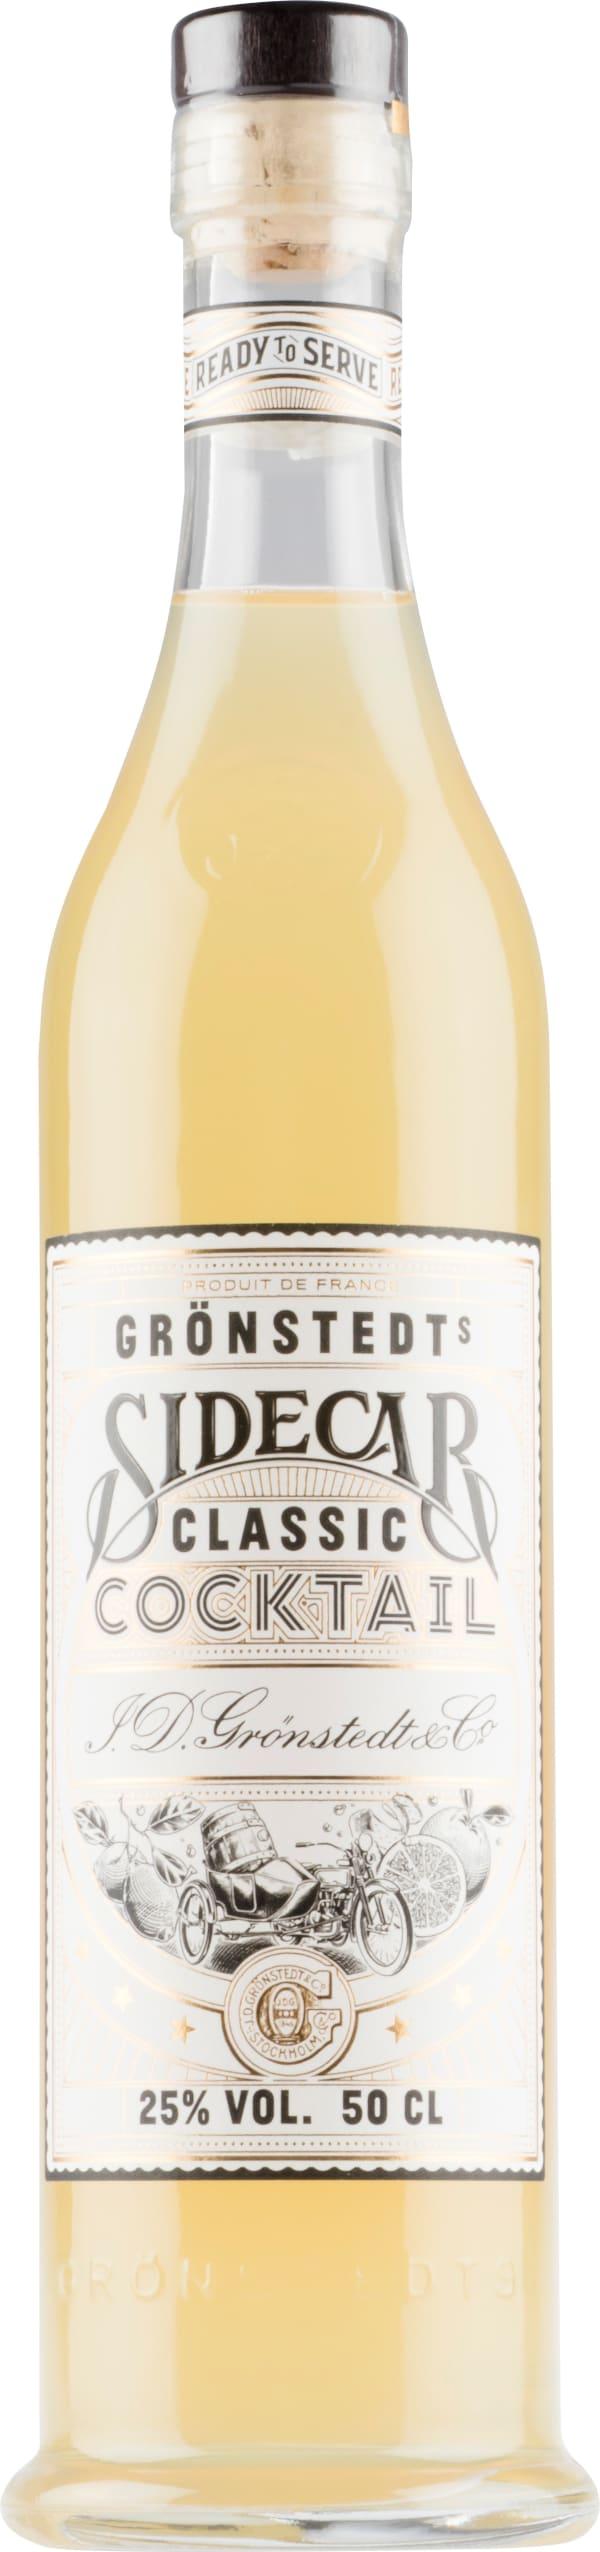 Grönstedts Sidecar